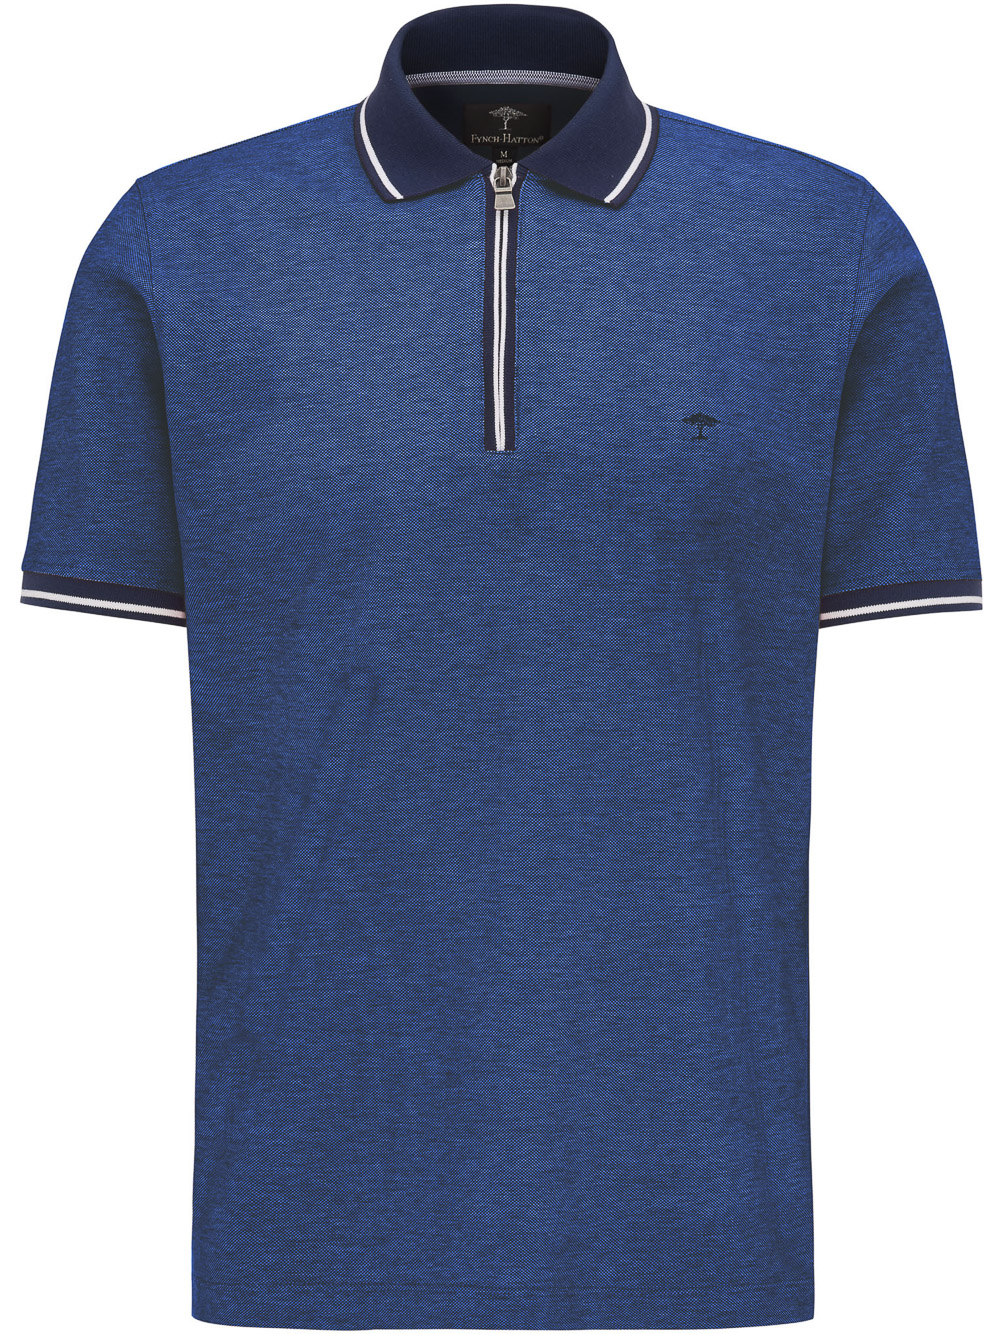 FYNCH-HATTON Μπλούζα Polo 1120 1754-1668 ΜΠΛΕ